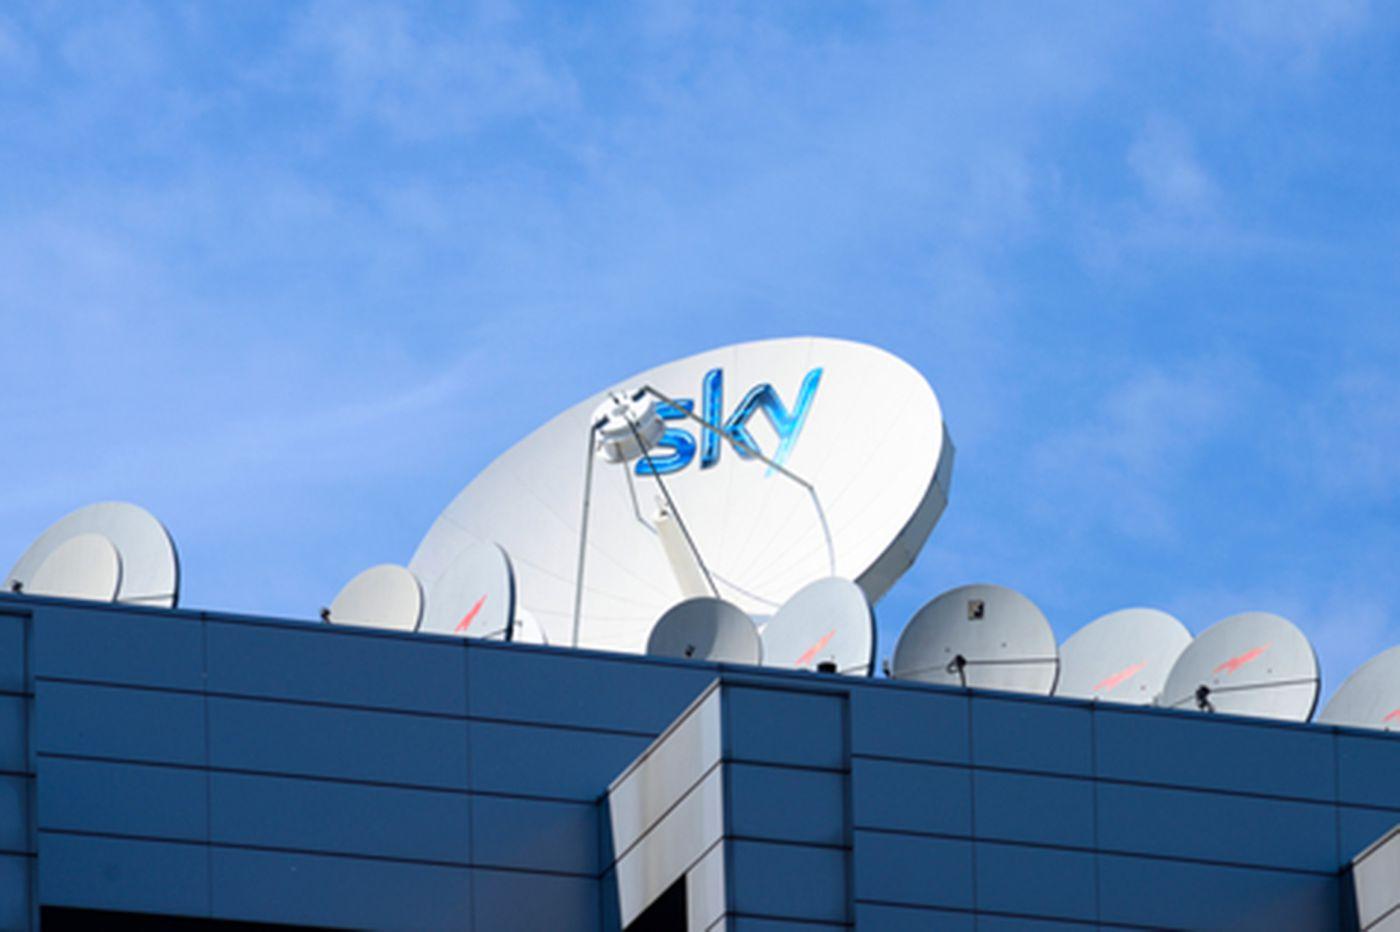 Comcast is now majority owner of Sky